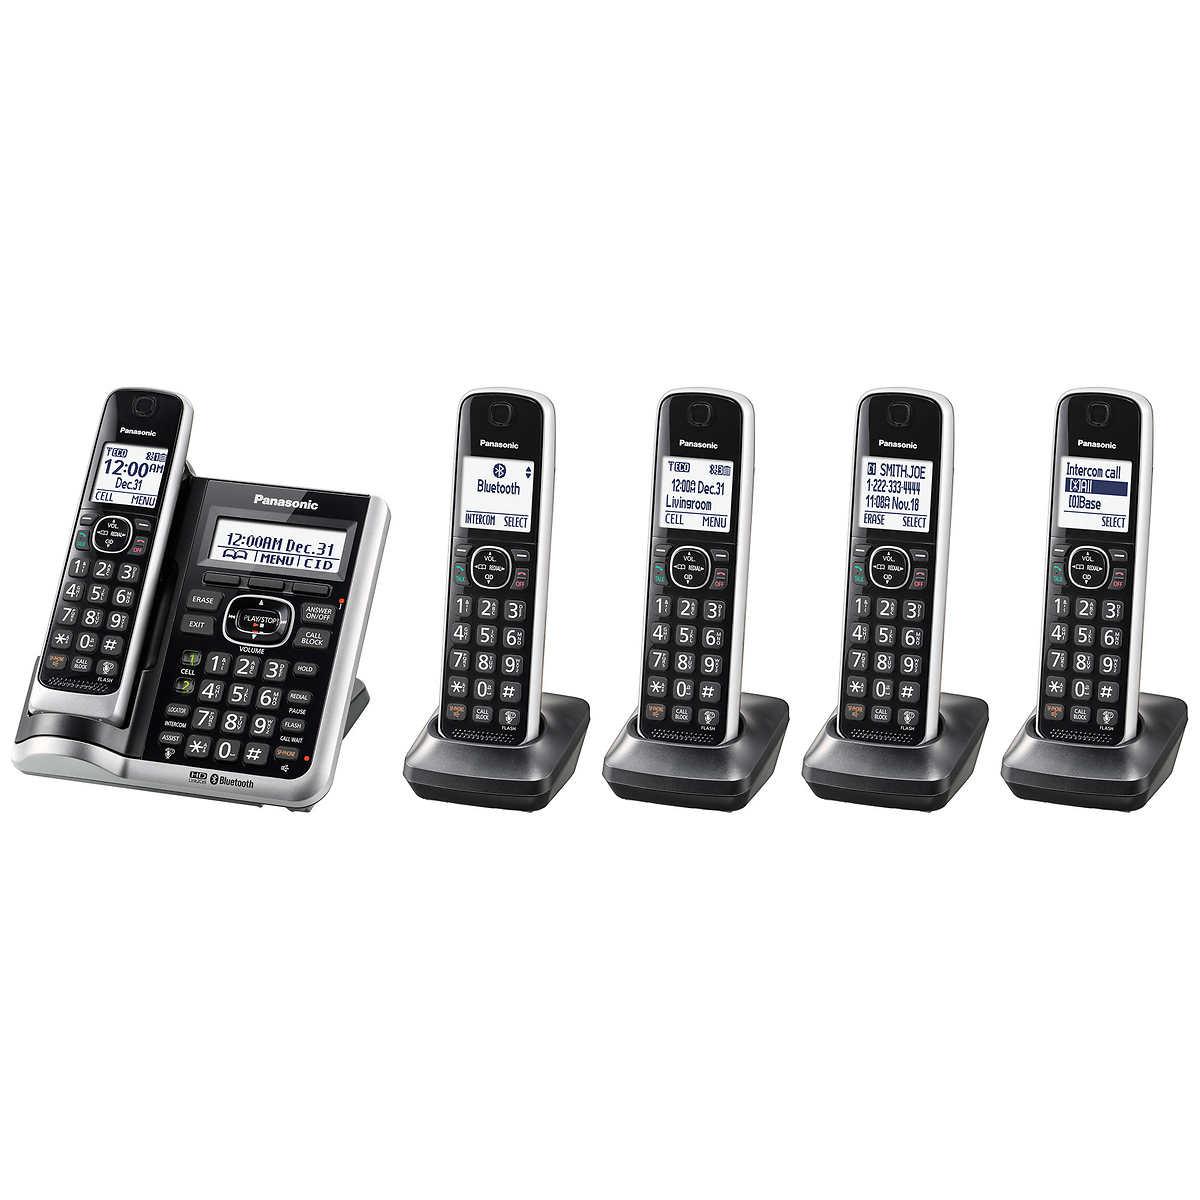 Panasonic Kx Tg885 Dect 60 Bluetooth 5 Handset Phone Bundle